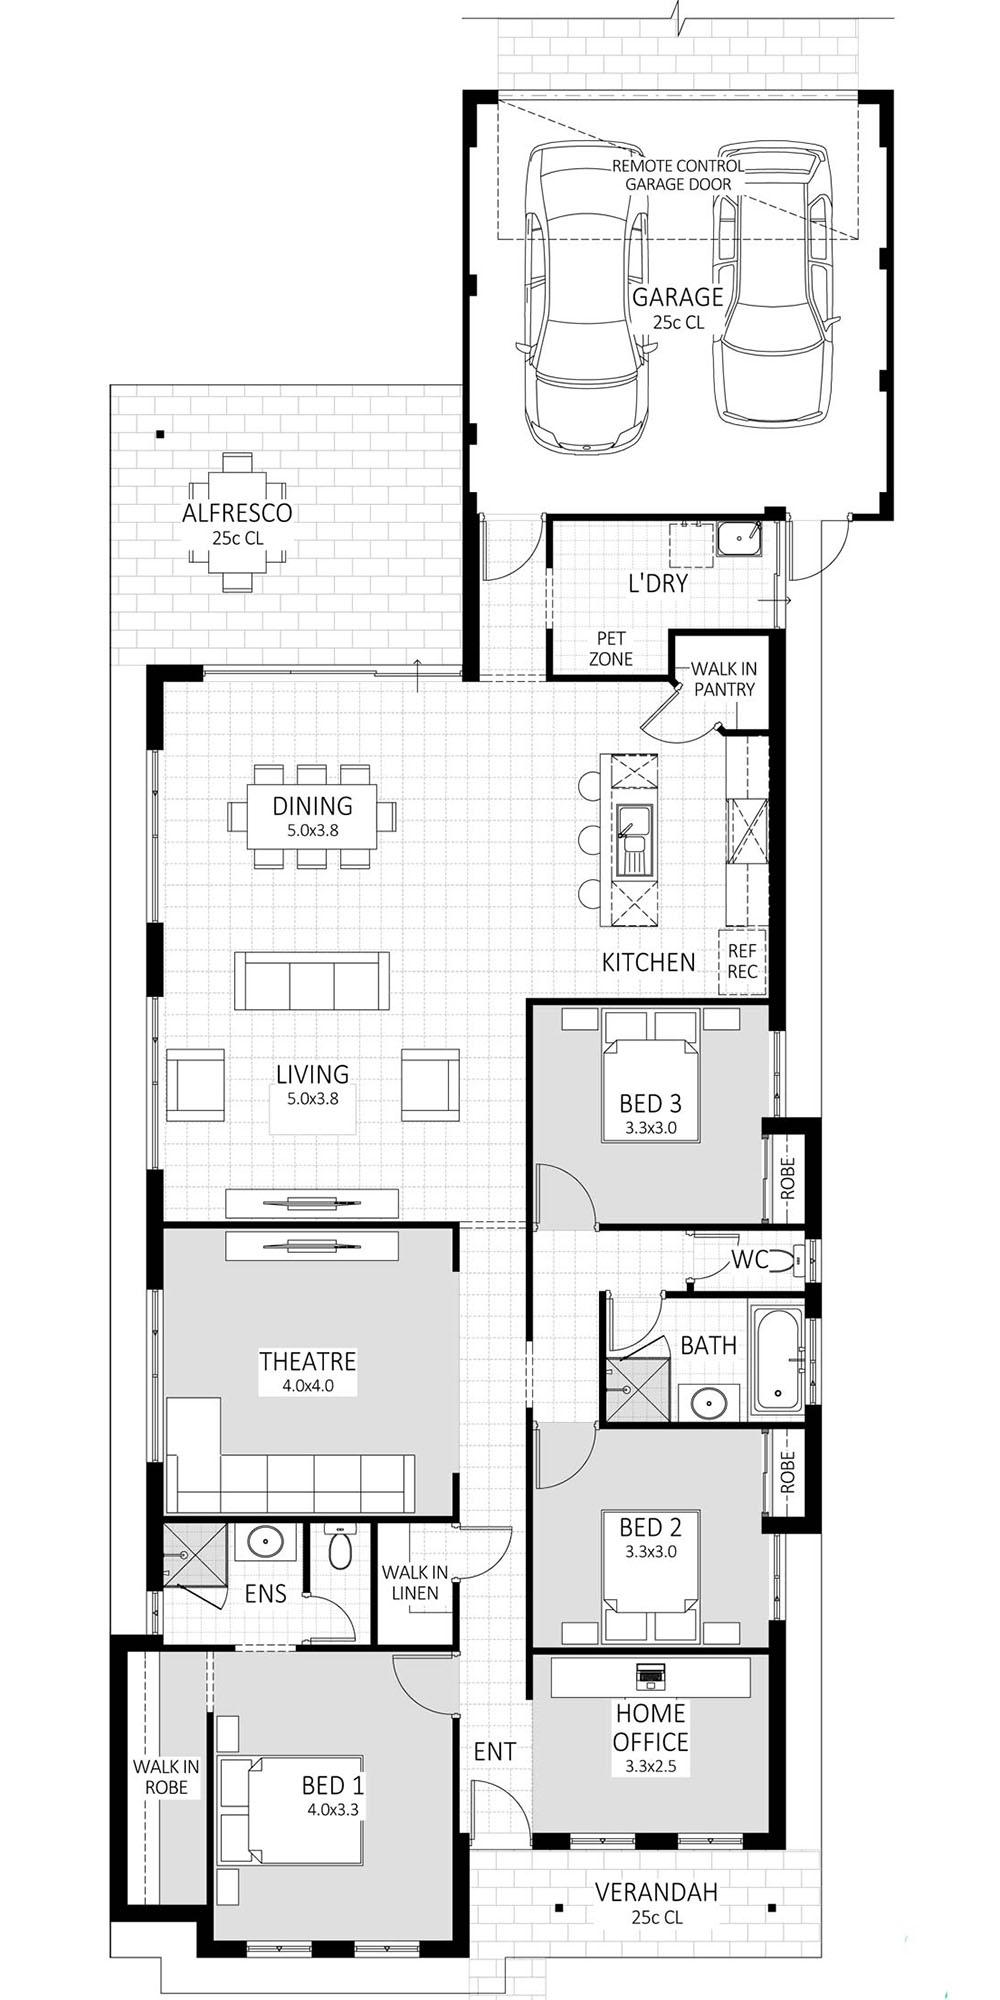 Sensation floorplan